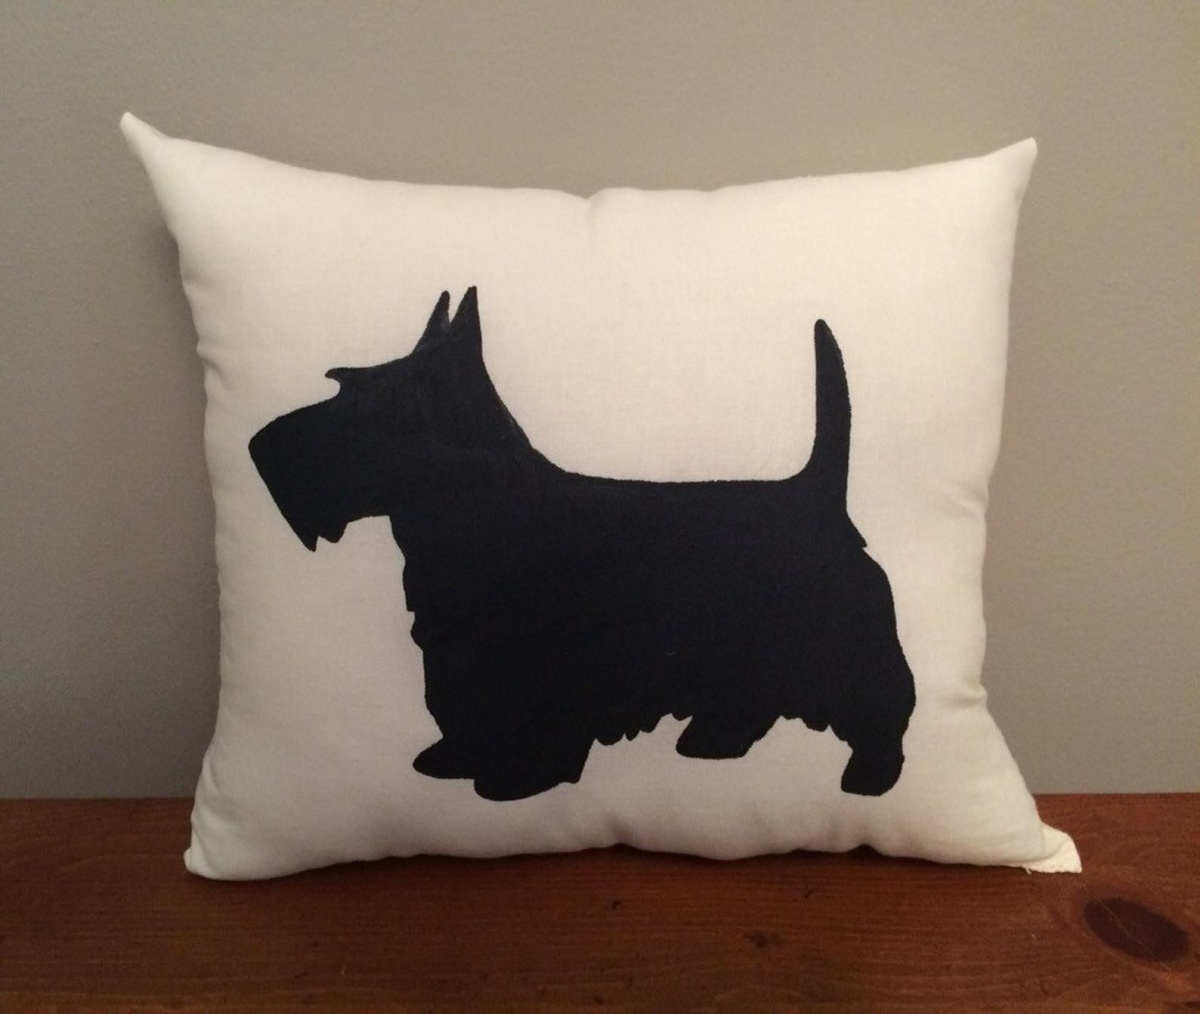 A classy silhouette pillowcase